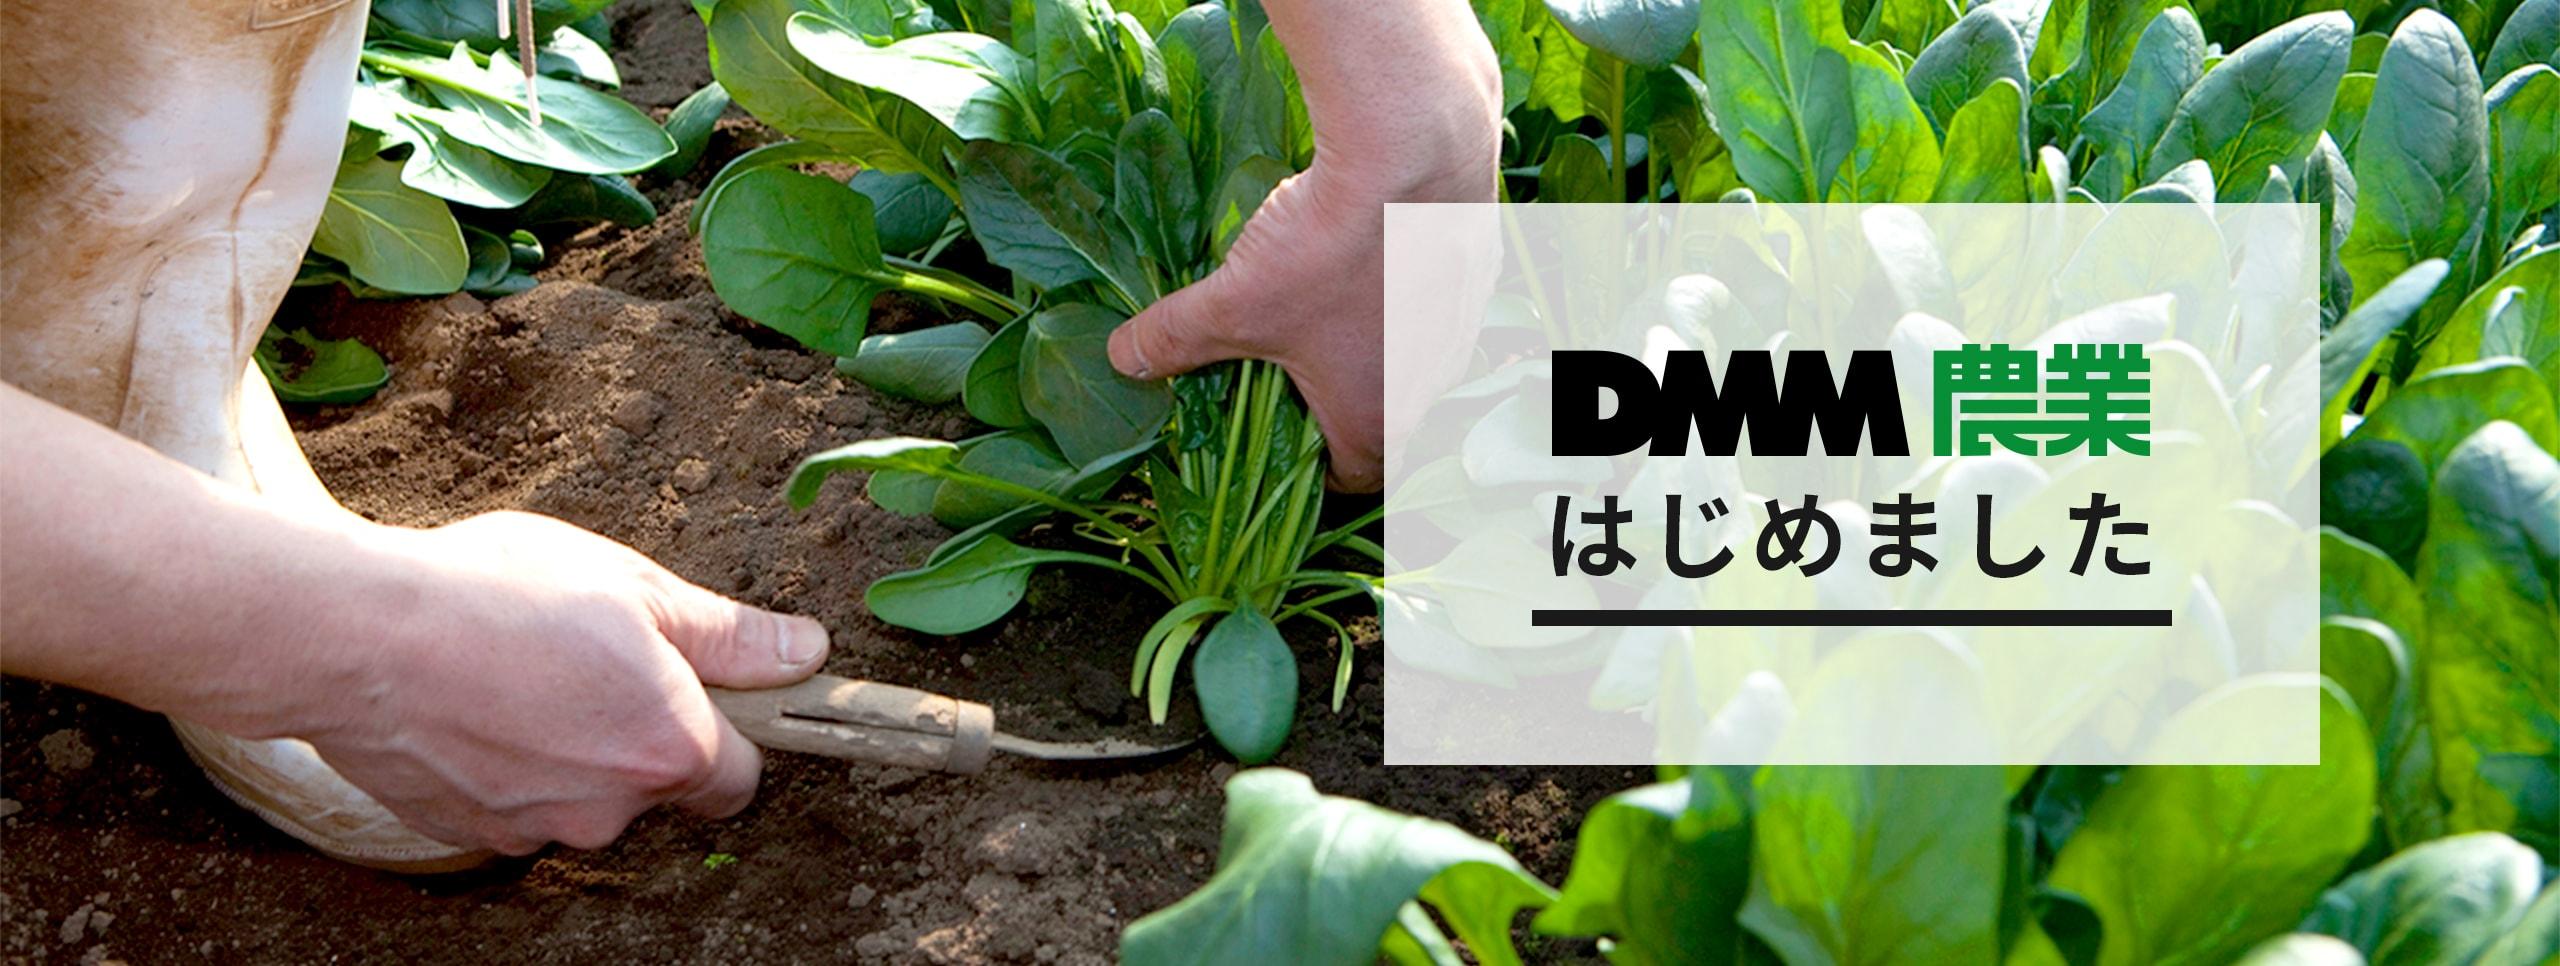 DMM農業はじめました